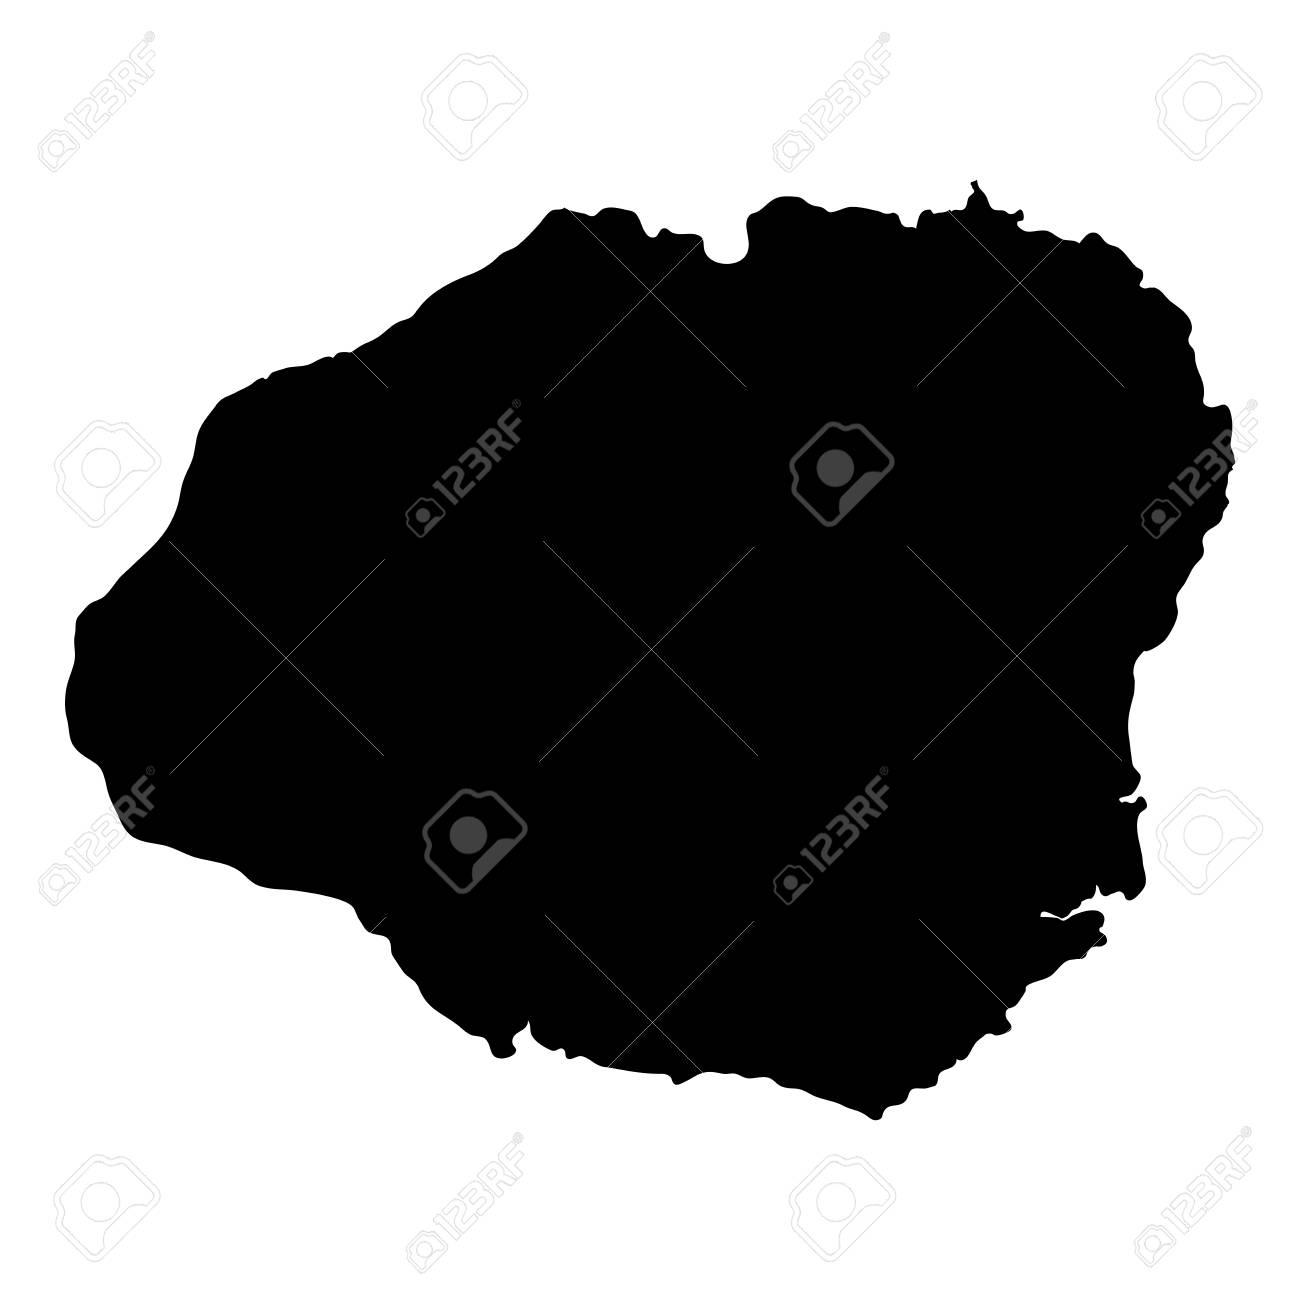 Kauai Map Of Island on map of glasgow, map of johannesburg, map of cedar rapids, map of miami, map of madrid, map of lansing, map of norfolk, map of new york, map of salt lake city, map of kona, map of lanai city, map of porto, map of florence, map of kahului, map of ontario, map of hilo, map of honolulu, map of singapore, map of hawaiian islands, map of cancun,